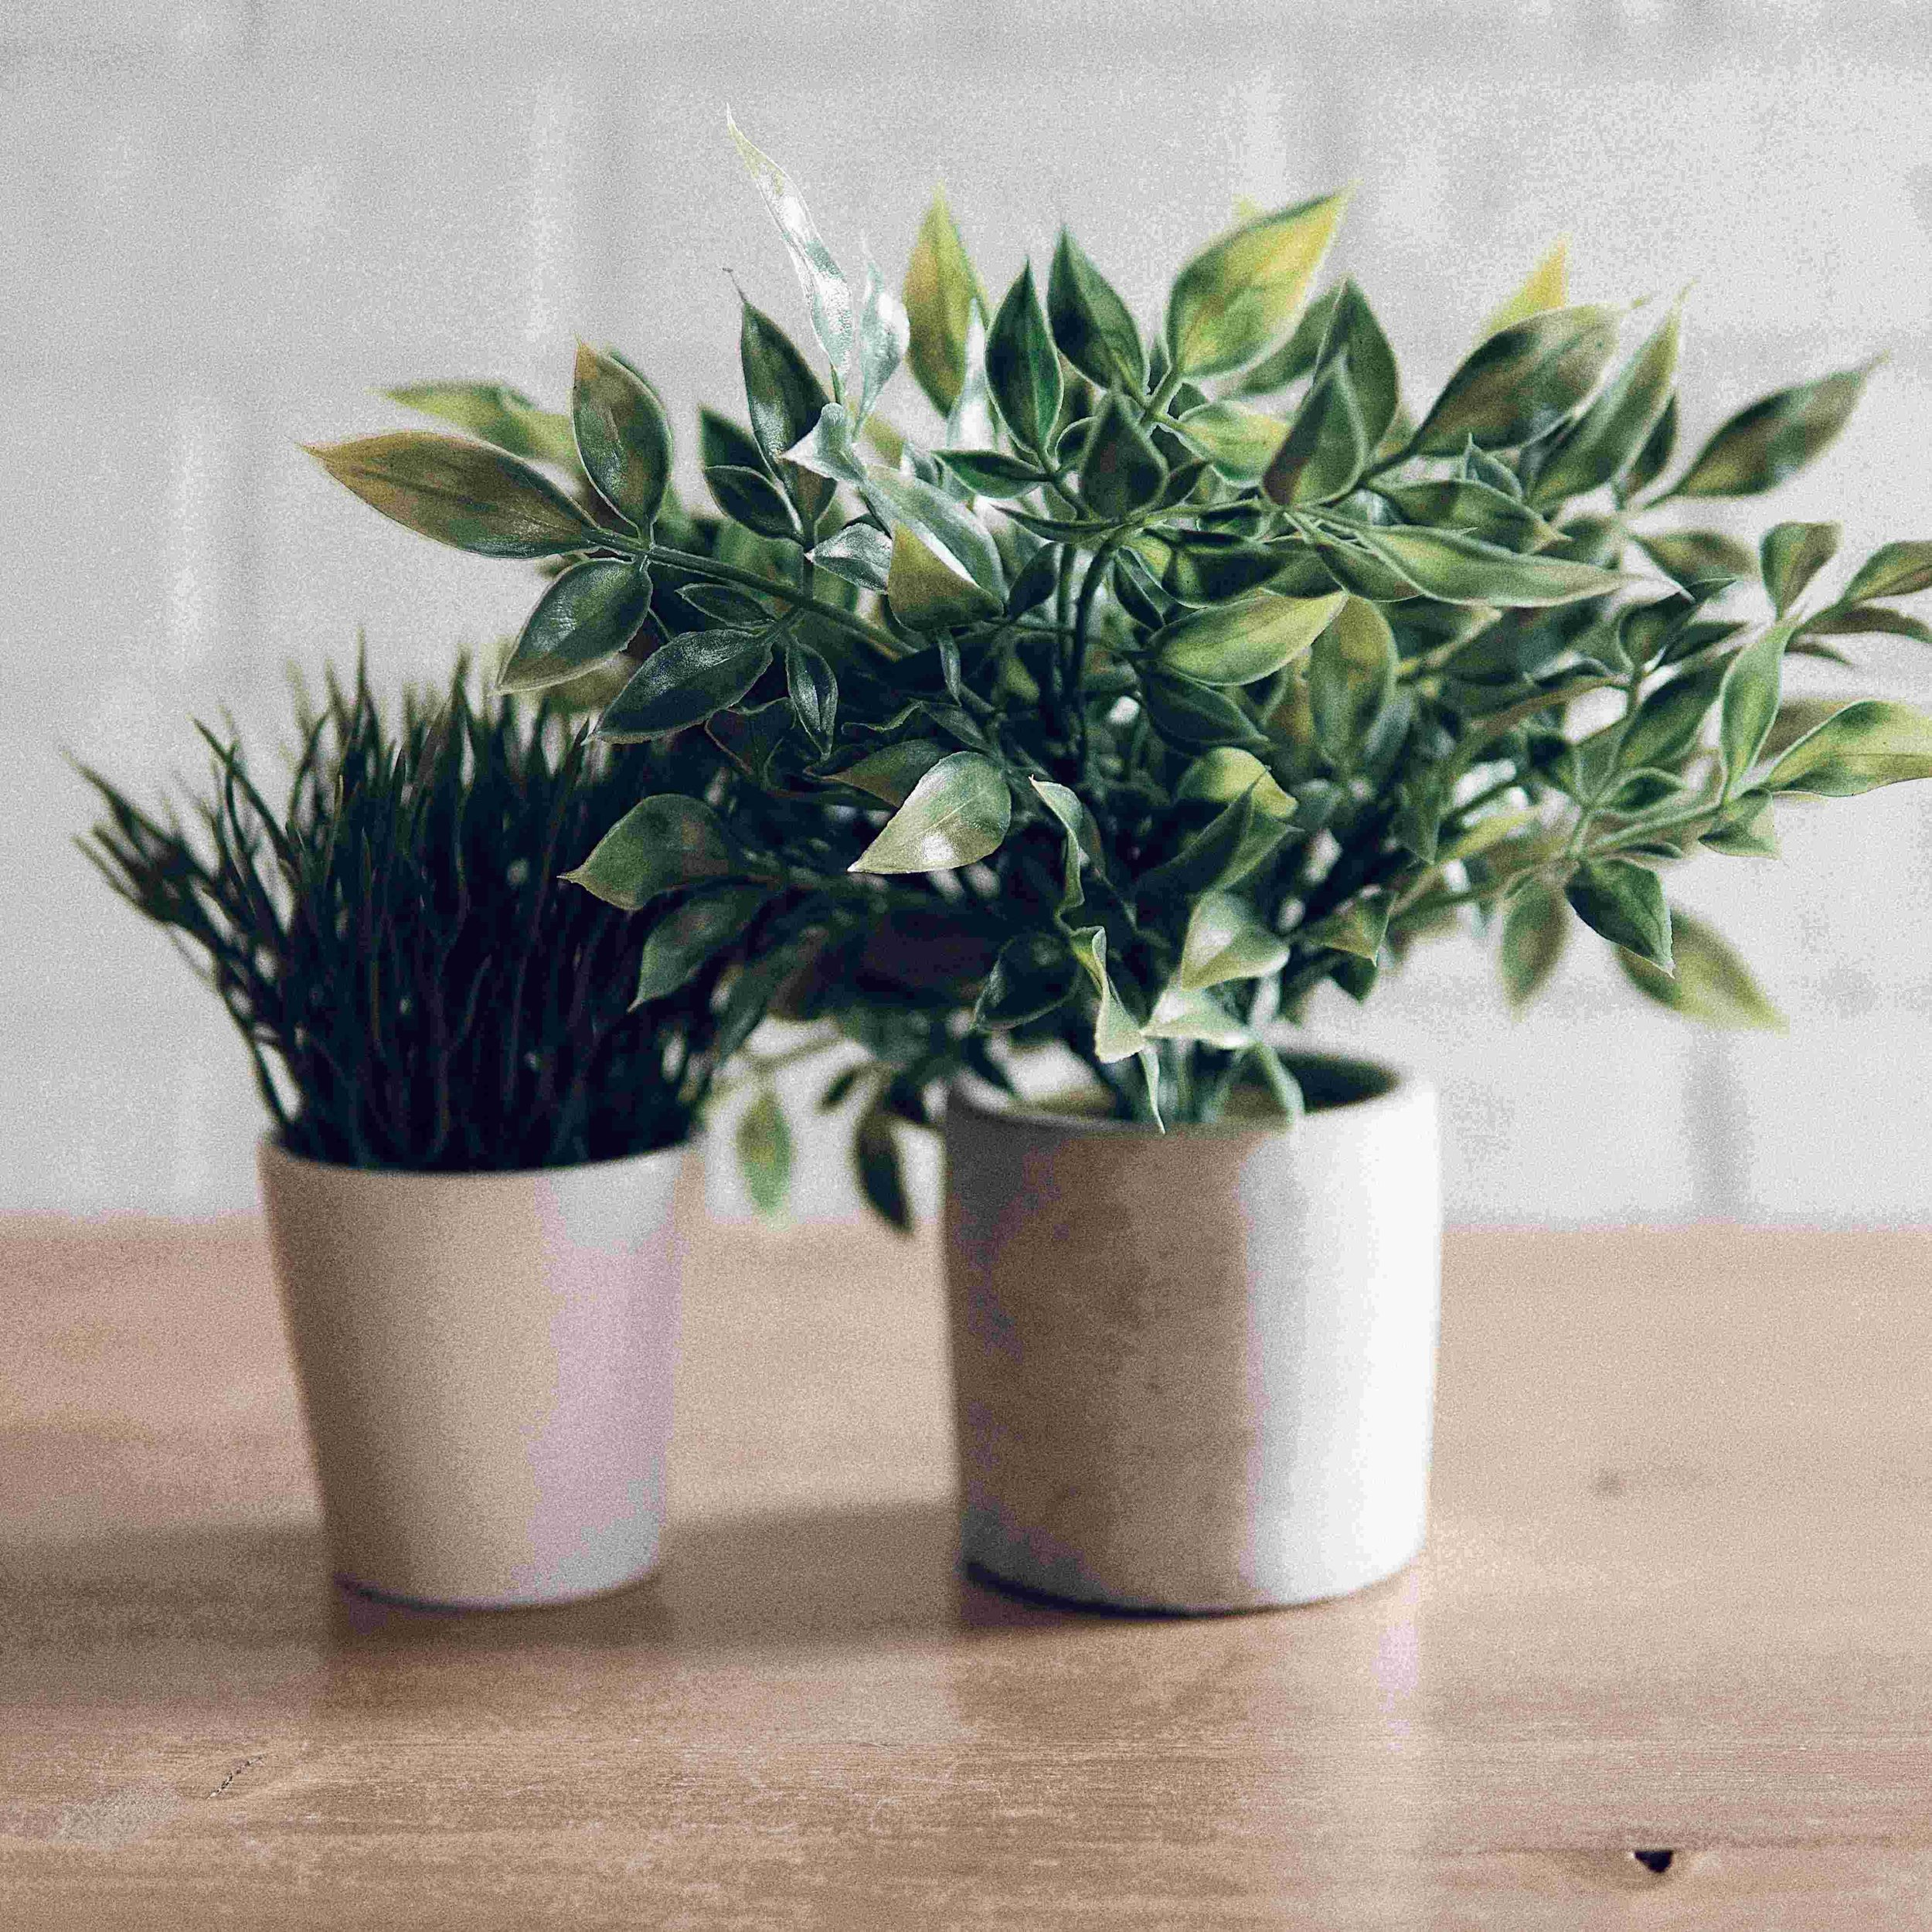 faux plants in pots for zero maintenance